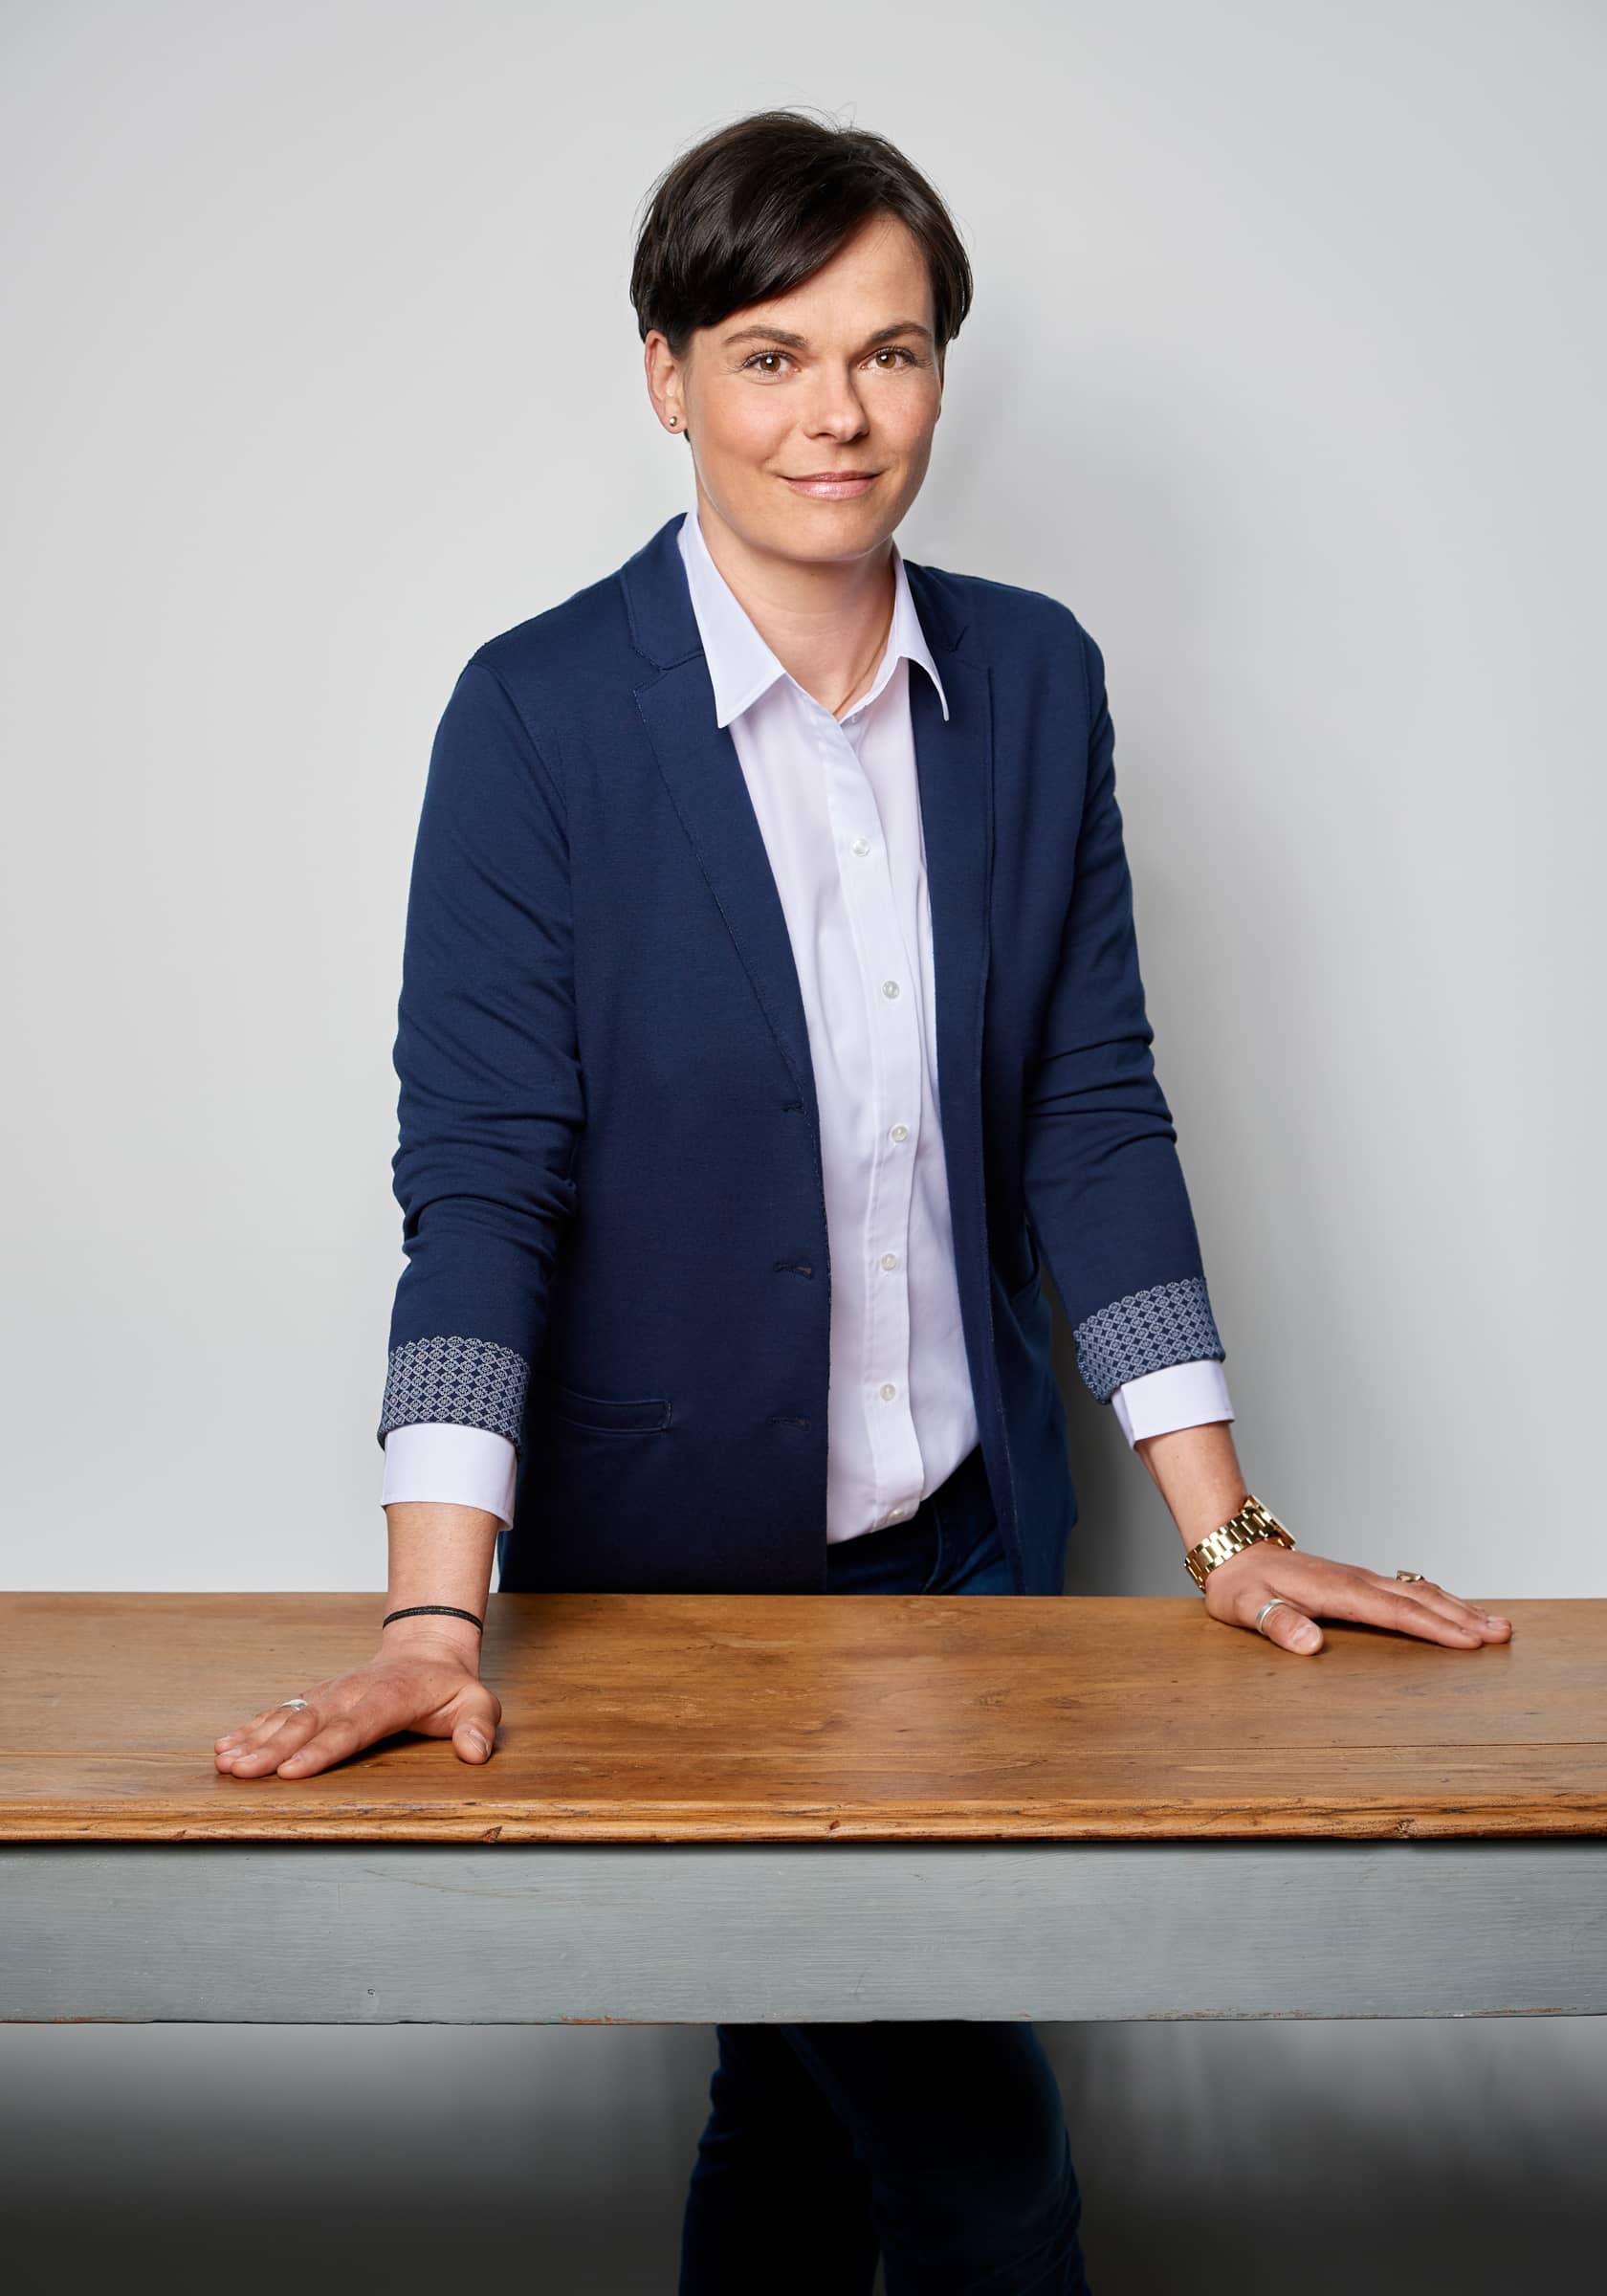 Ellen Jaros